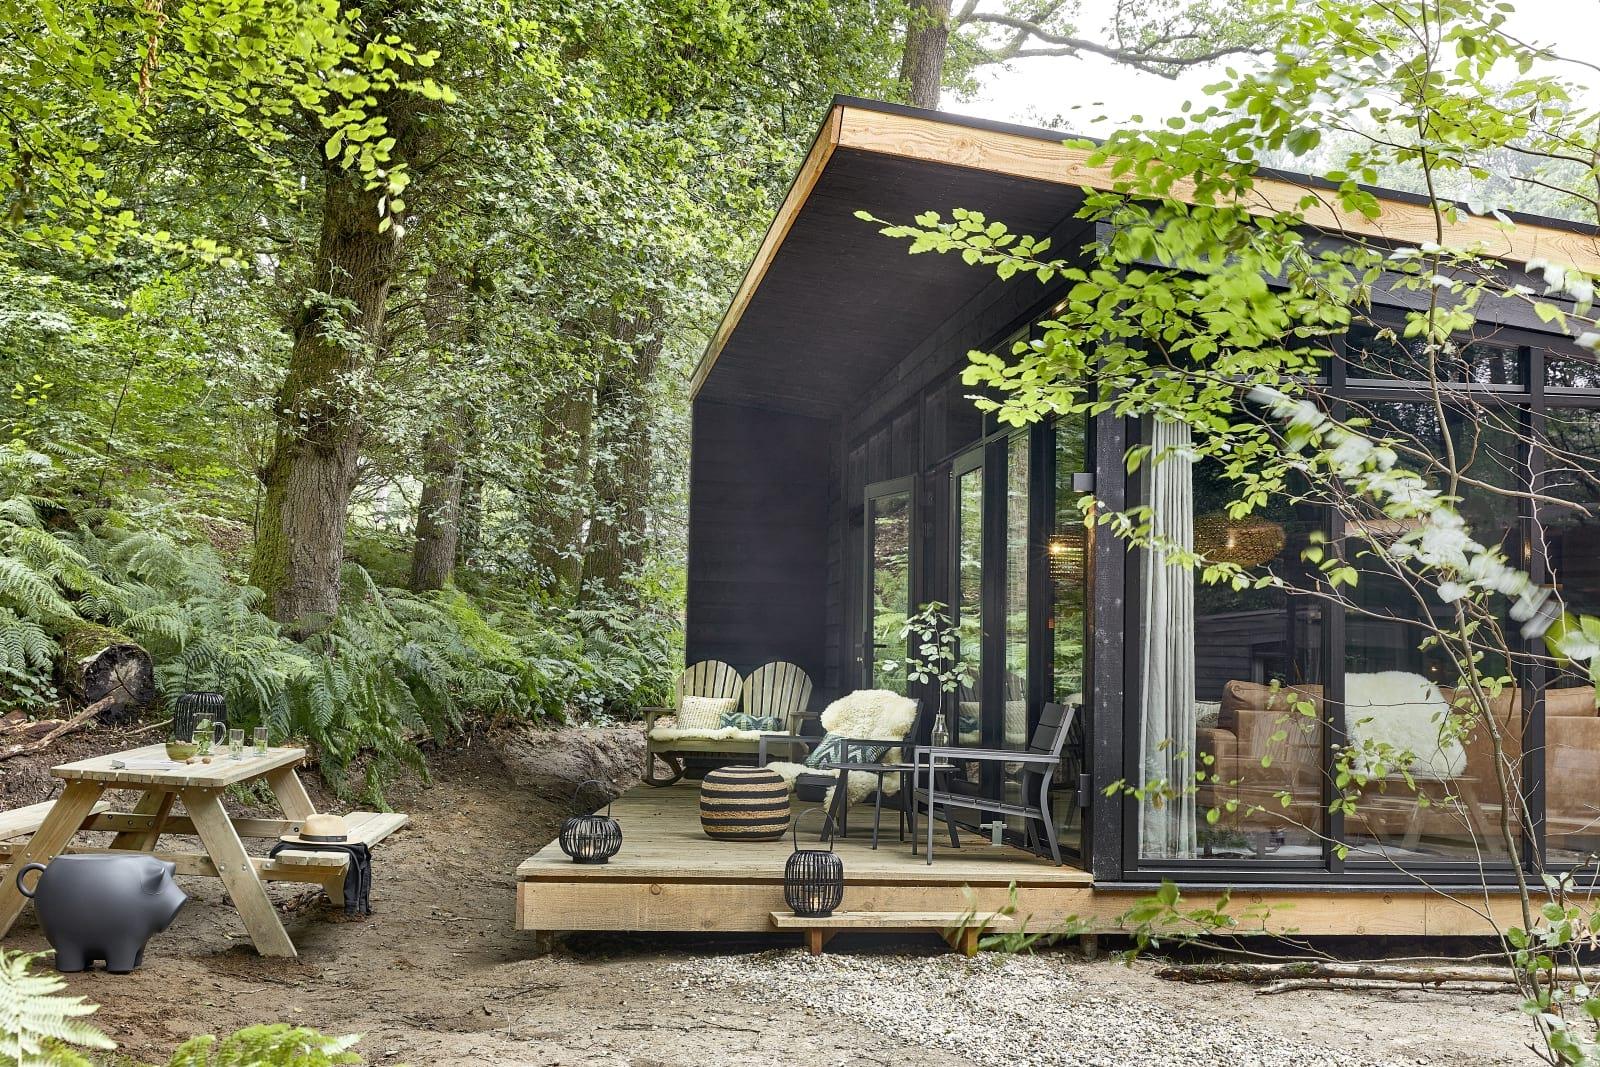 Supertrips - Forest Cabin midden op de Veluwe